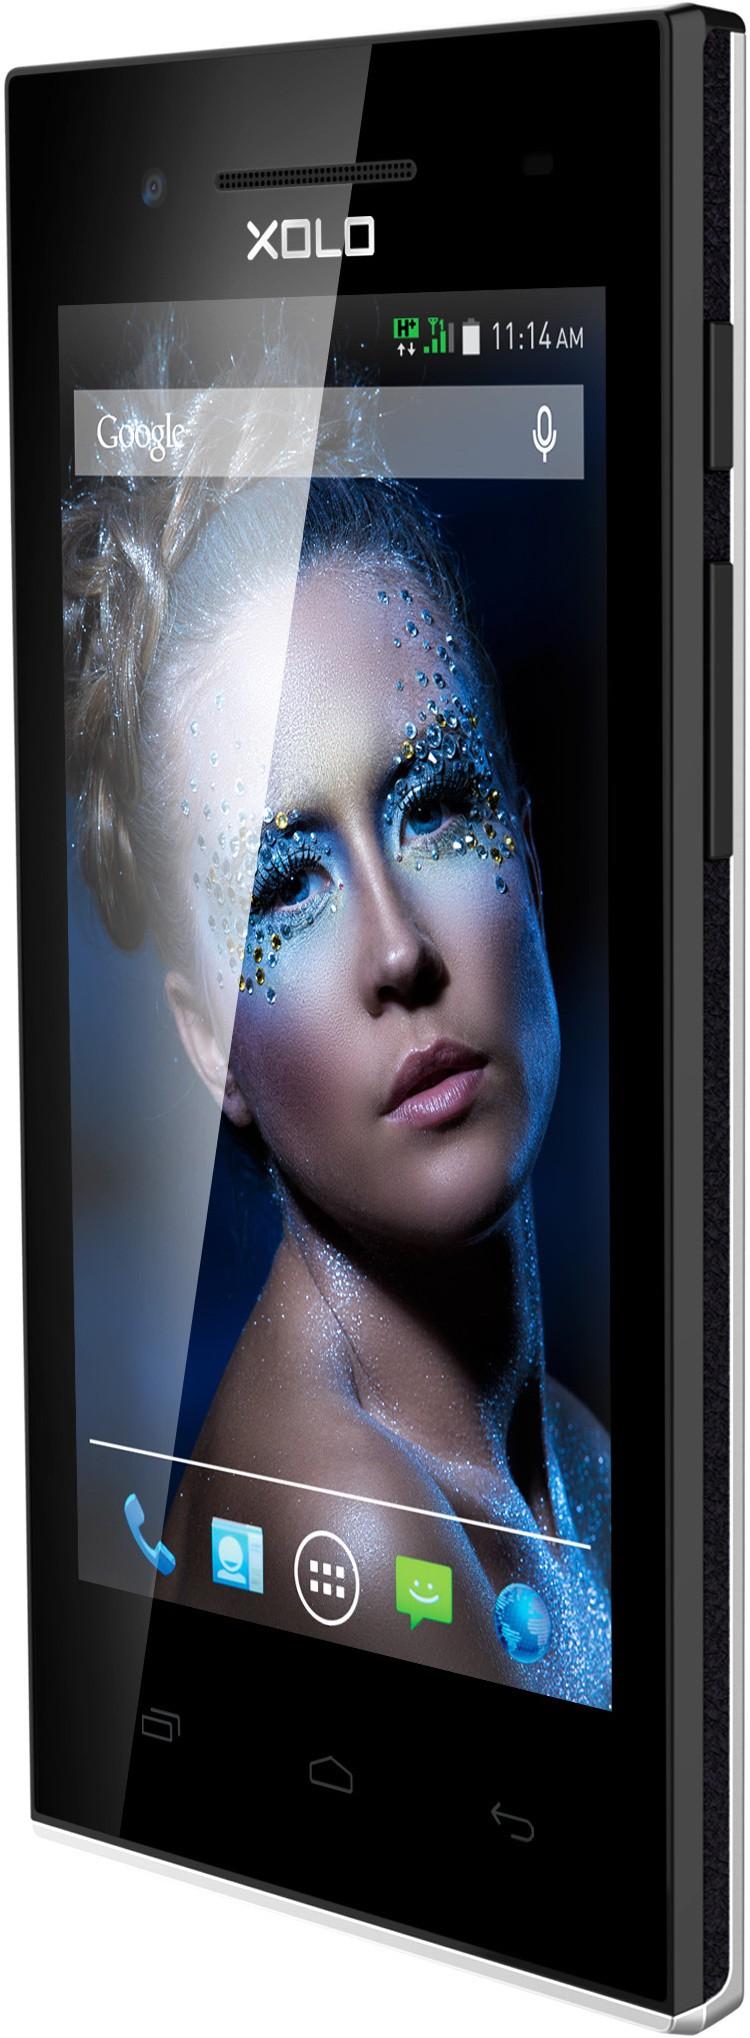 XOLO Q520S (512MB RAM, 4GB)